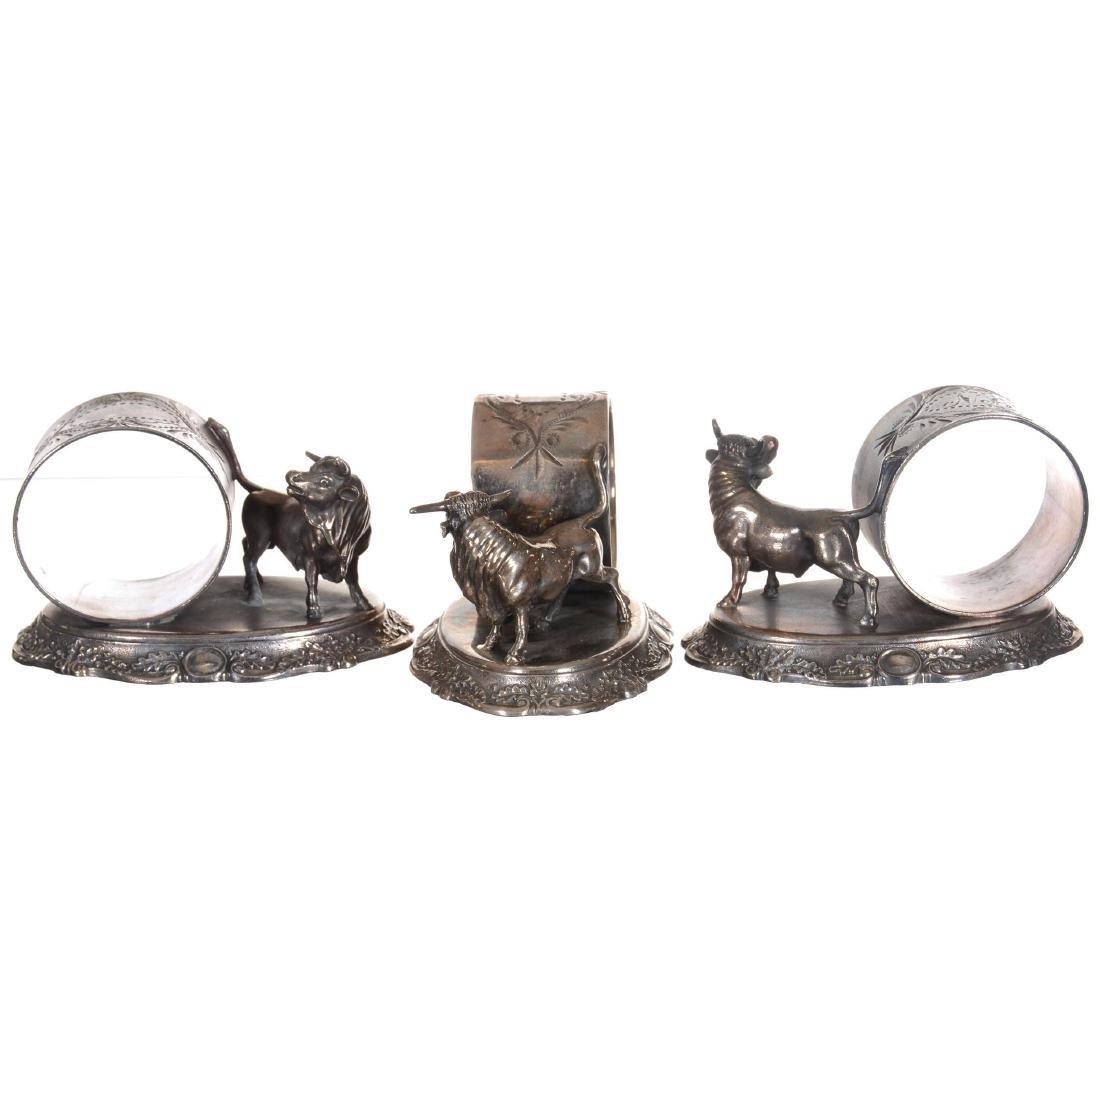 Three Silver-plate Napkin Rings - 2